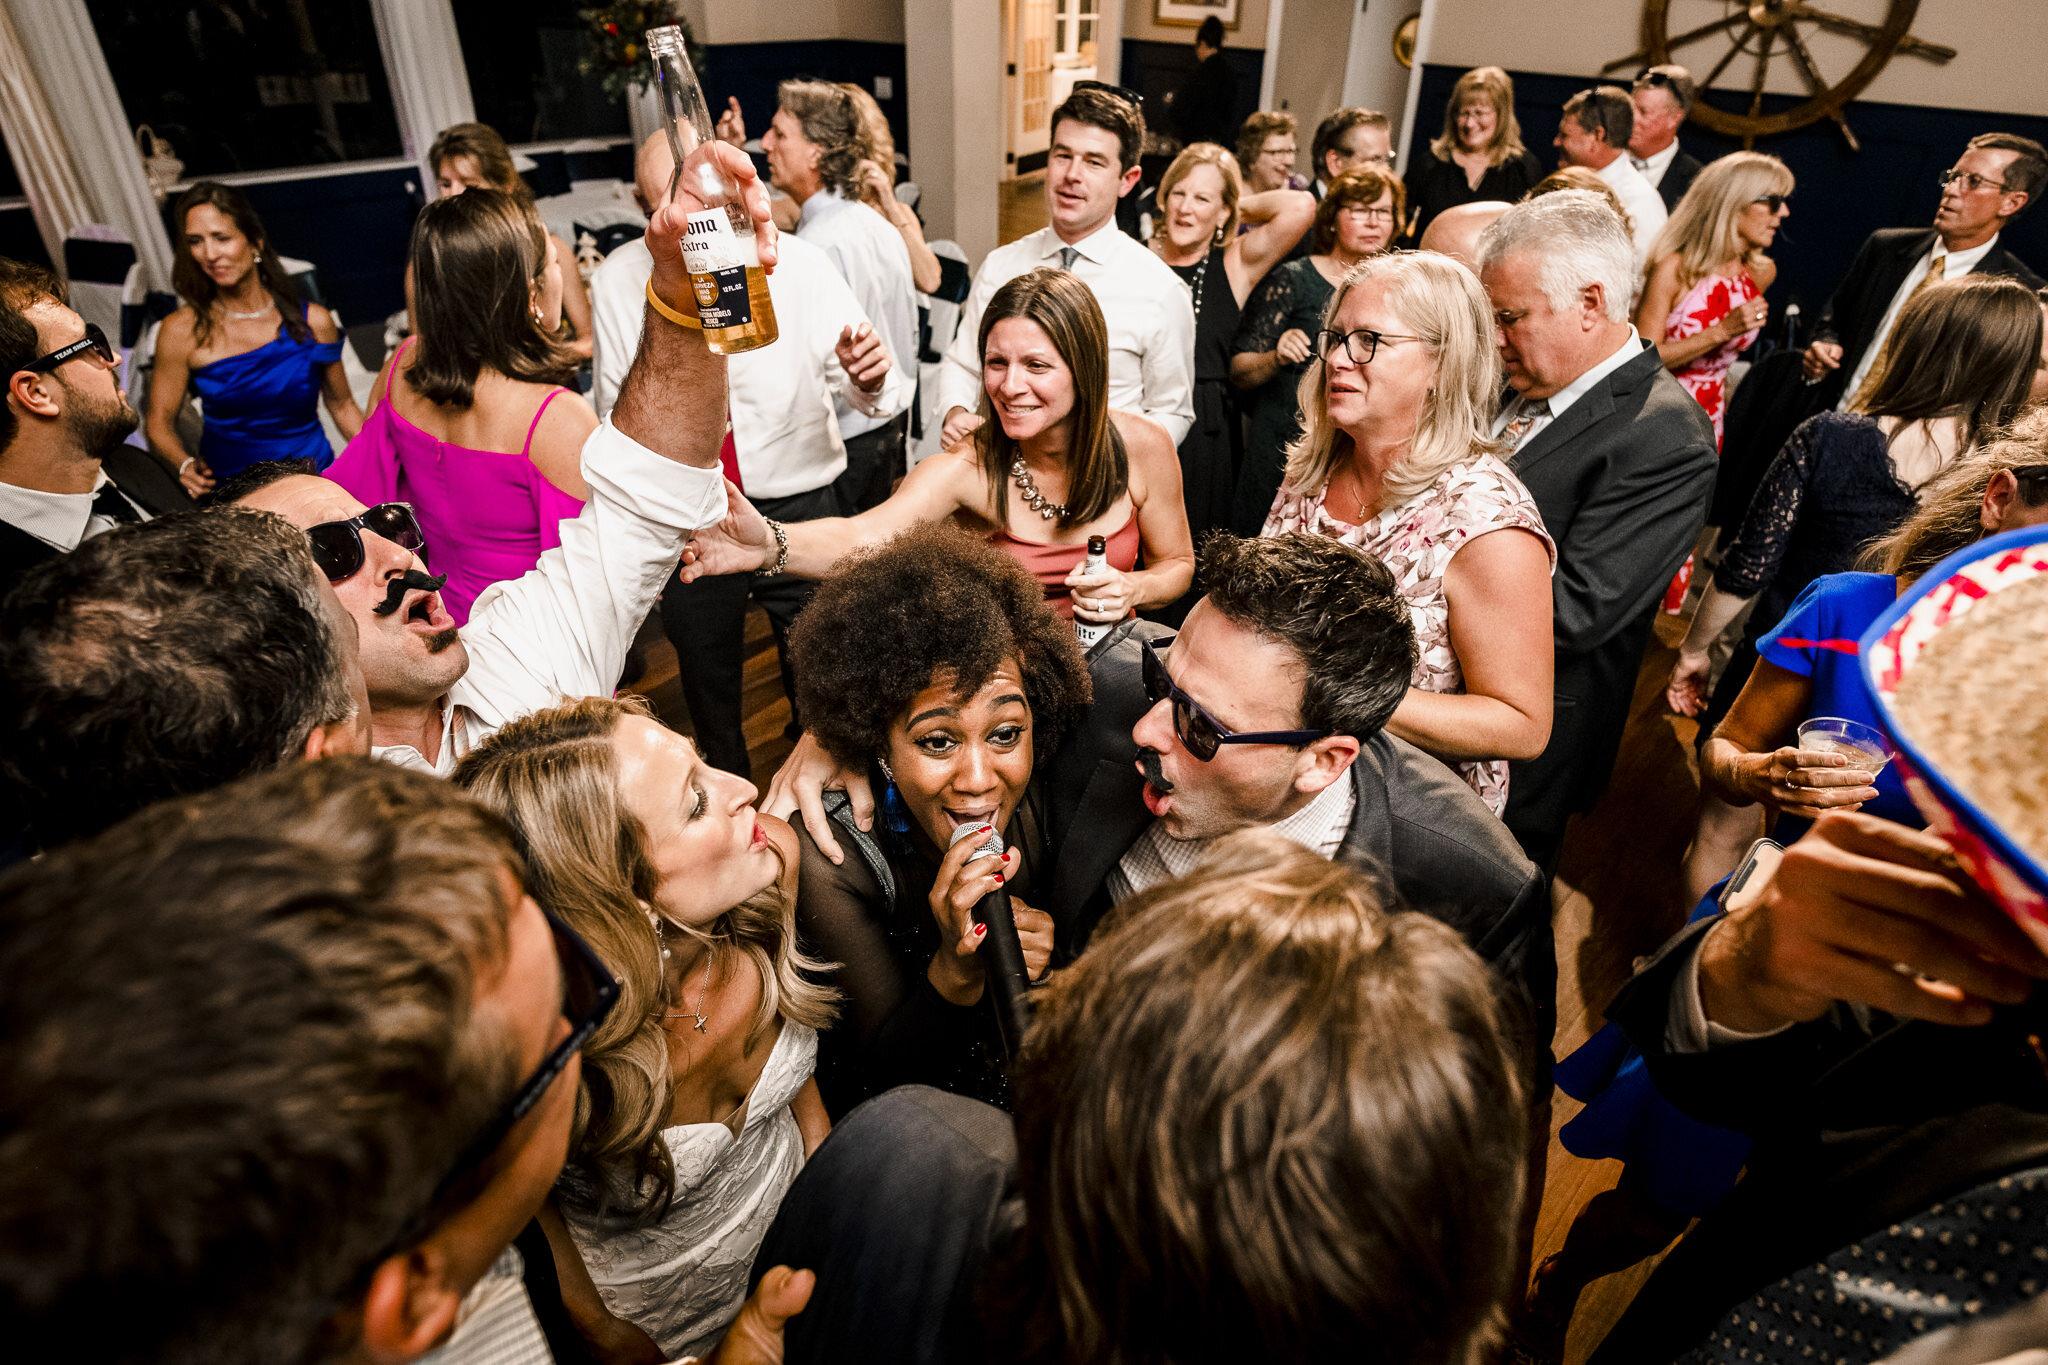 Snell-Ocean-City-Yacht-Club-New-Jersey-Wedding-Photographer-43.JPG